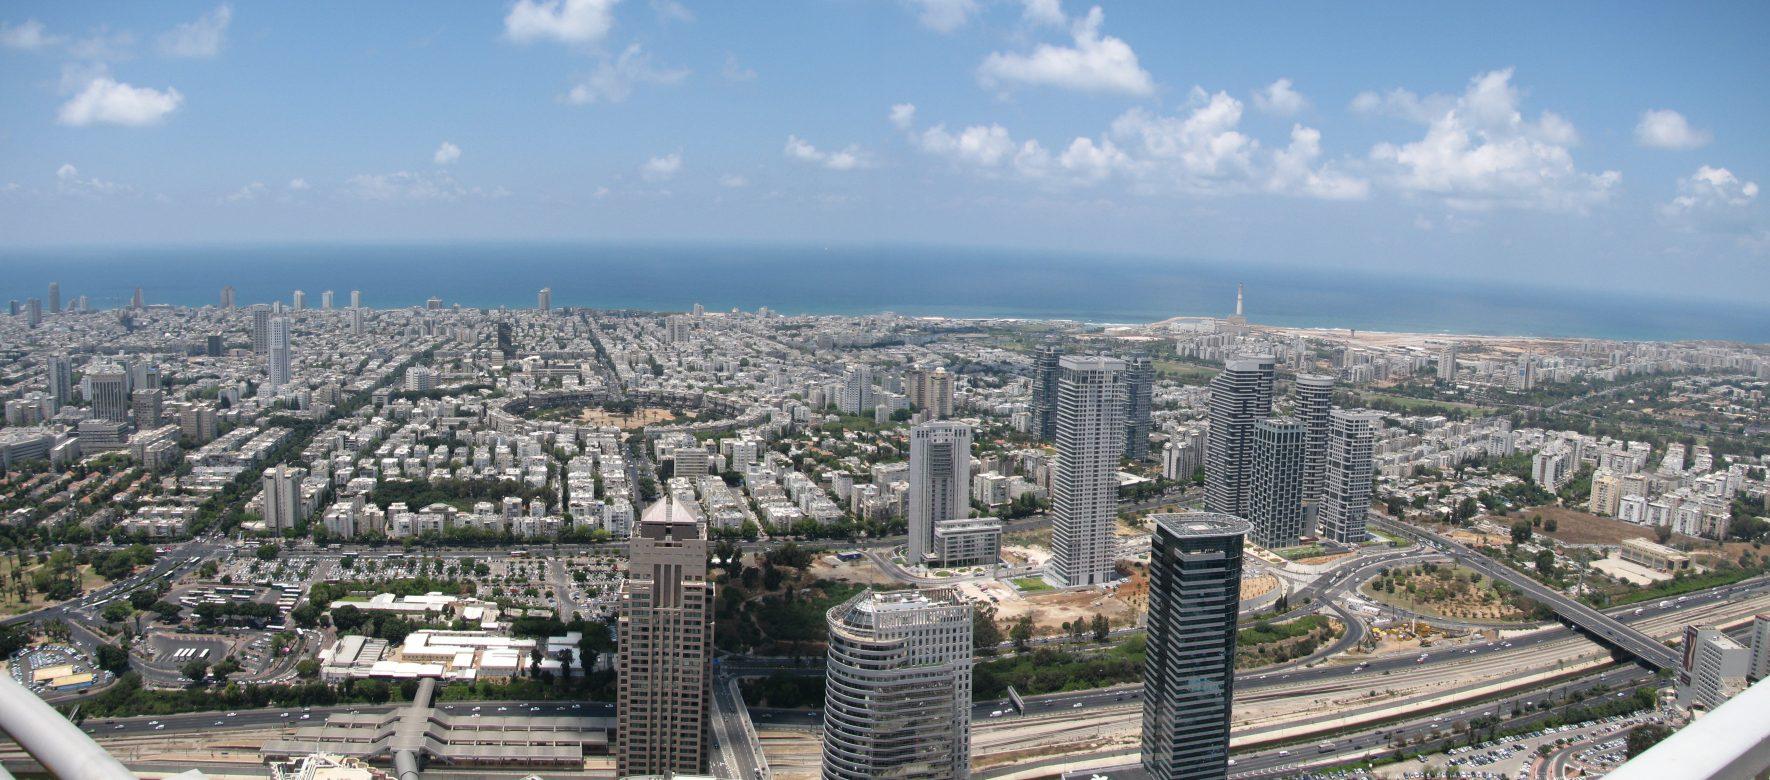 Google organise son start-up week-end à Tel-Aviv